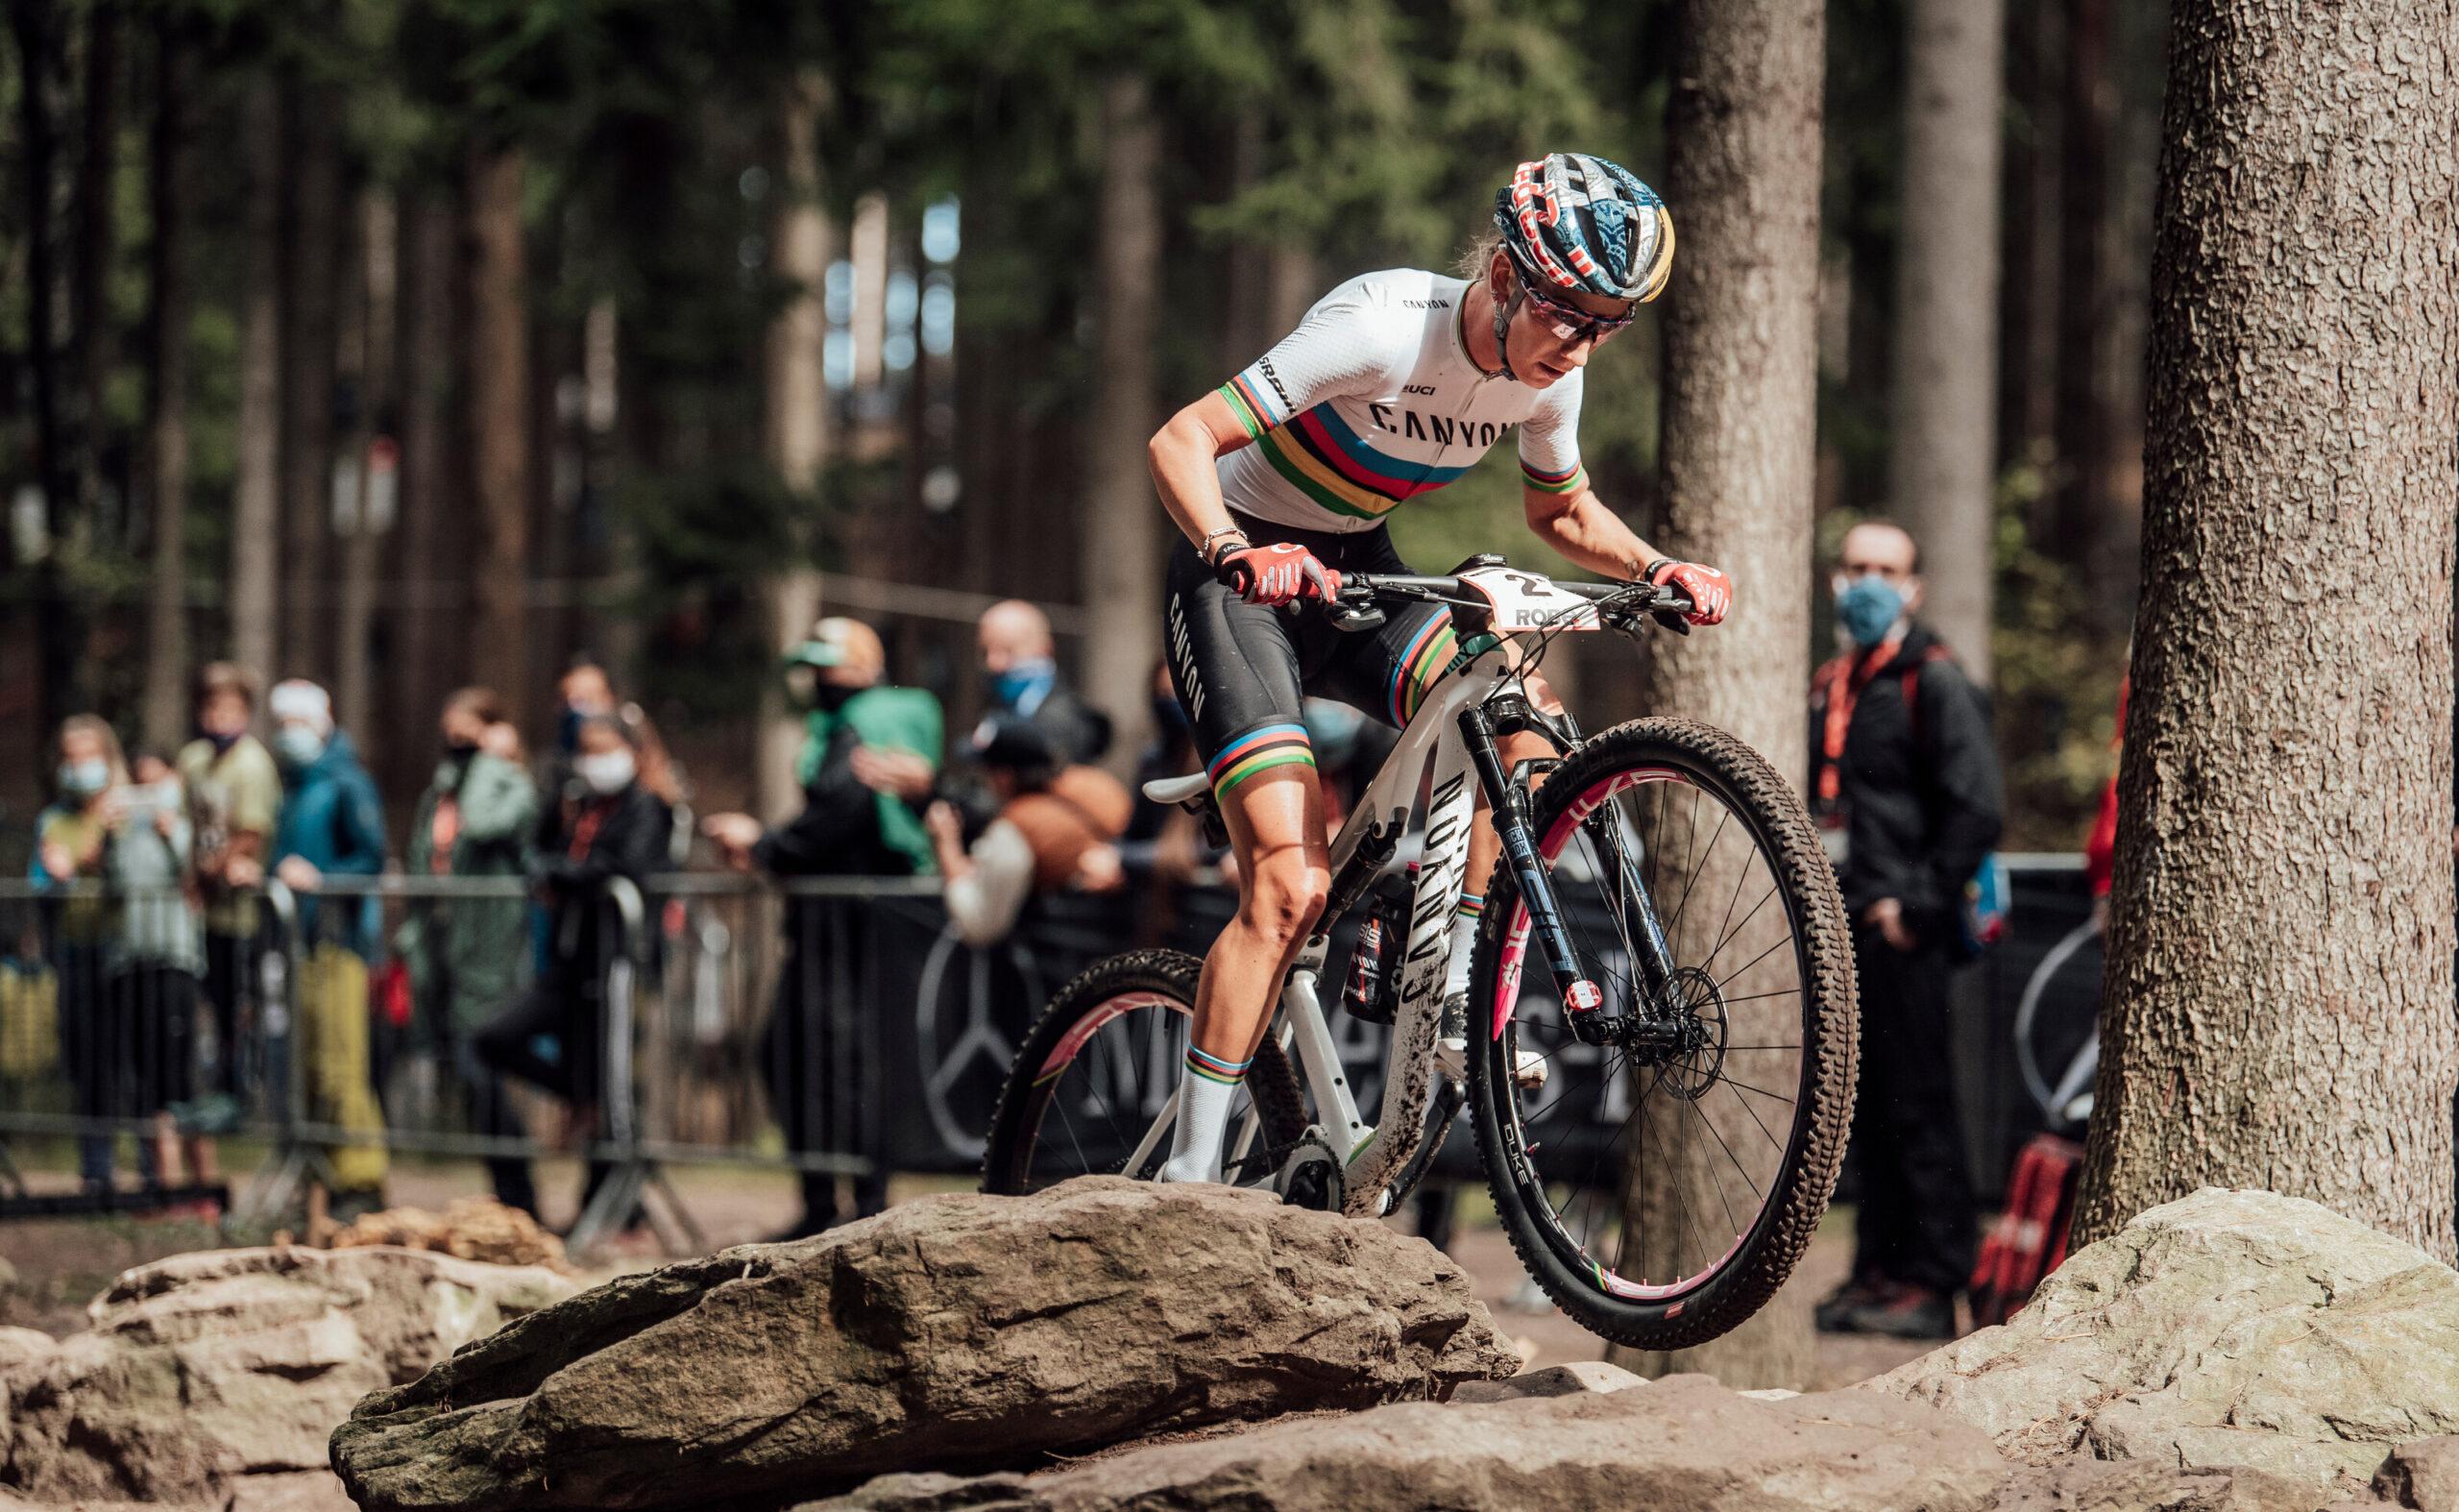 Cyclisme - Pauline Ferrand-Prévot rejoint Canyon | allpresse